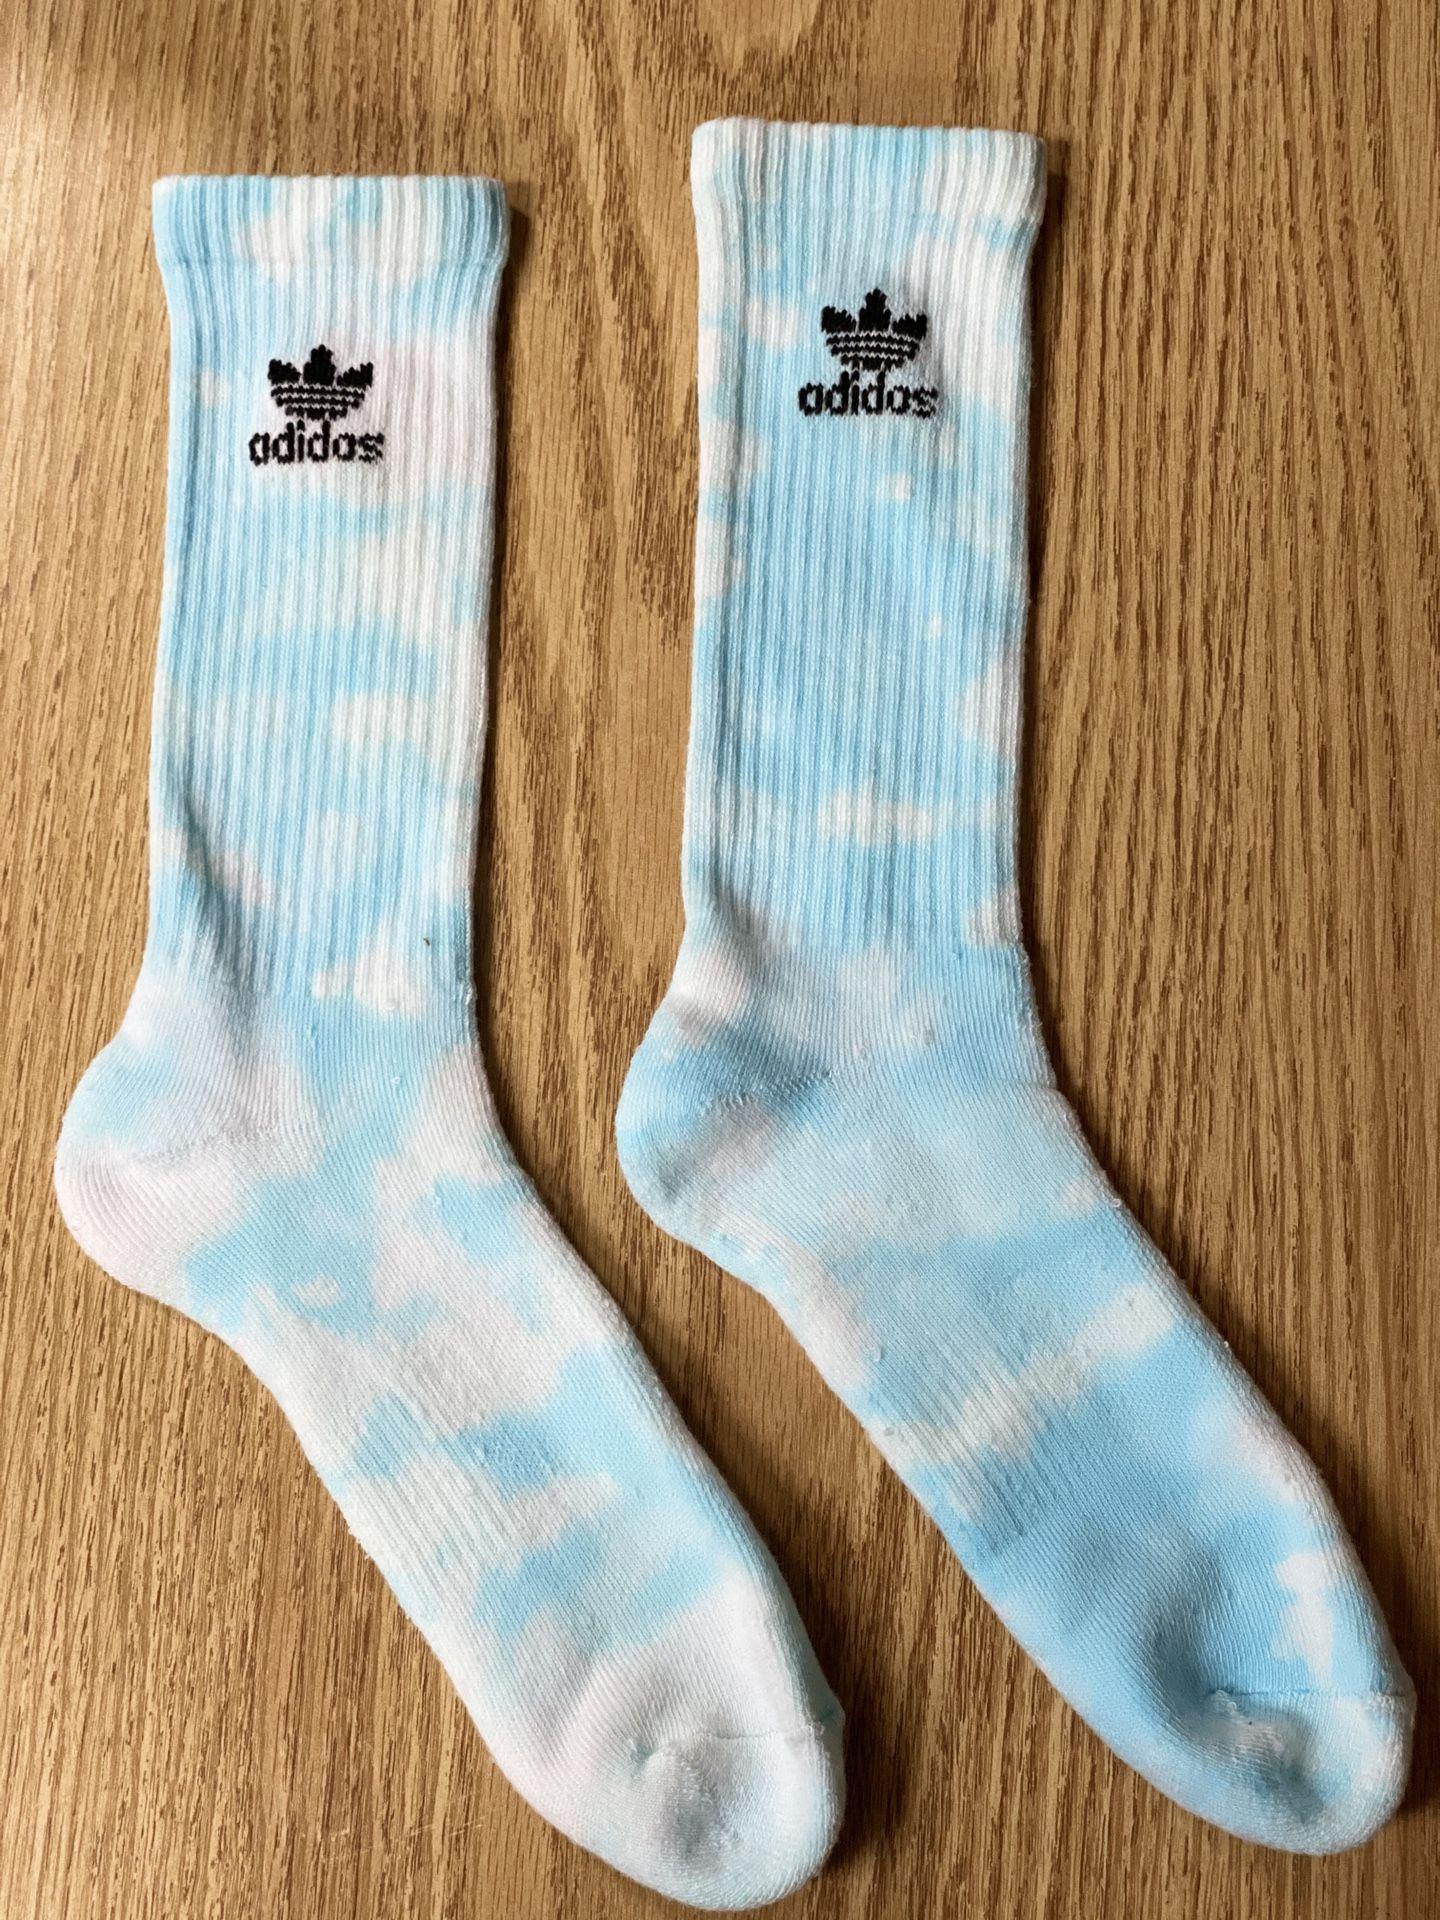 Adidas tie dye socks